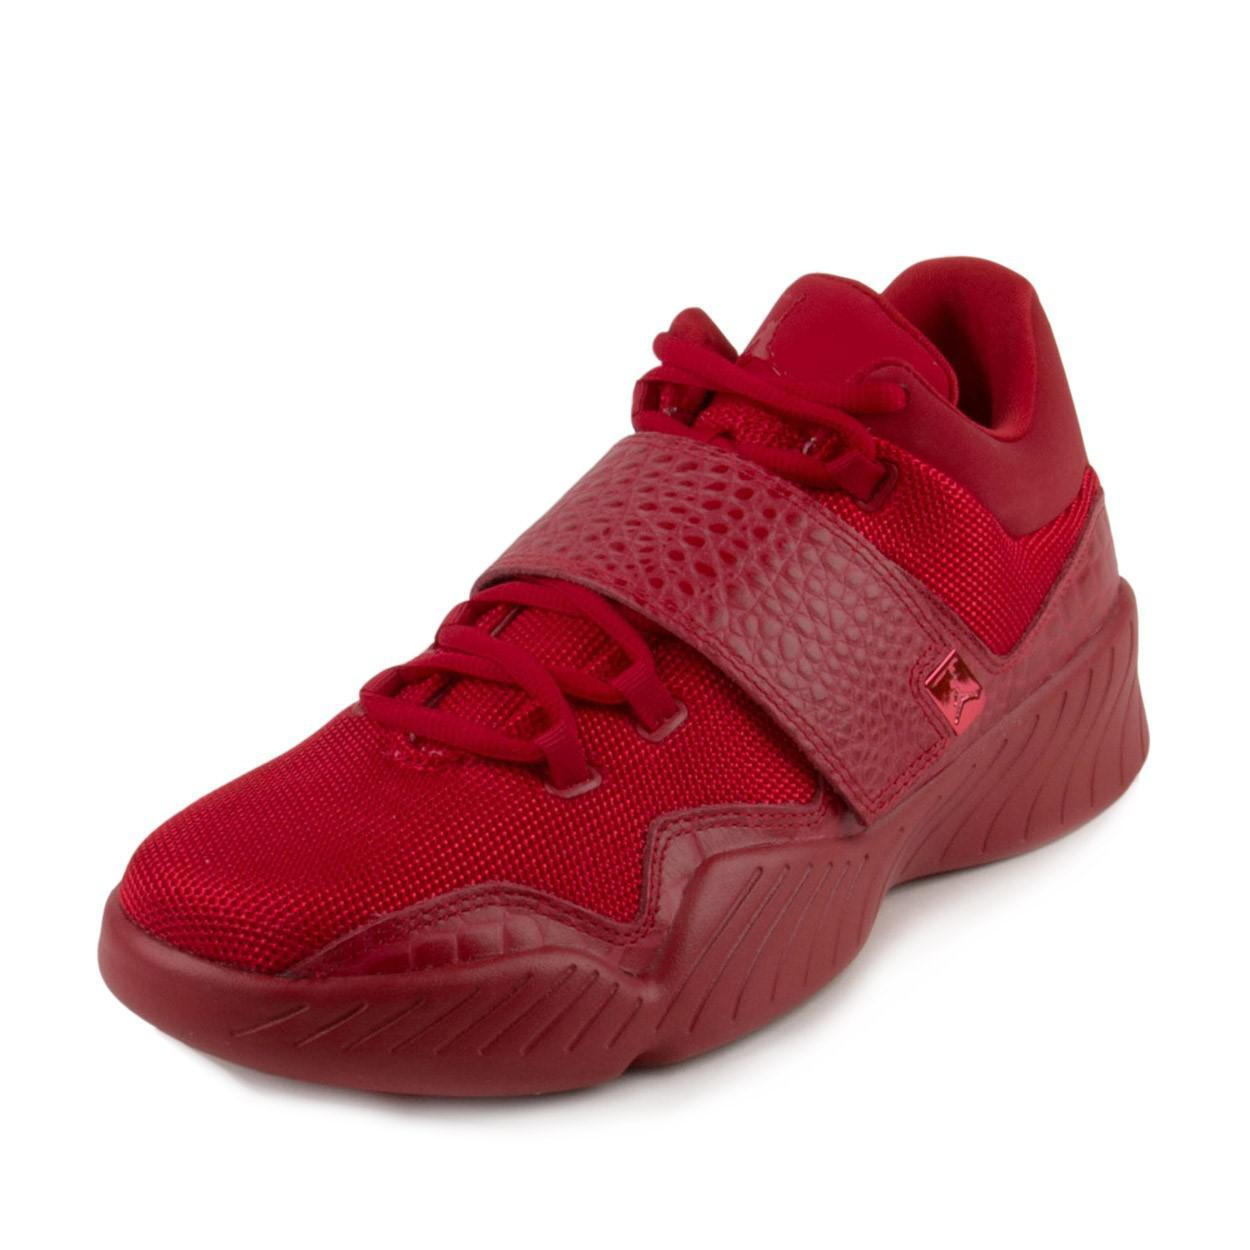 Lyst Nike 854557 600 : Jordan J23 Casual Shoe Red/red (gym Red/gym